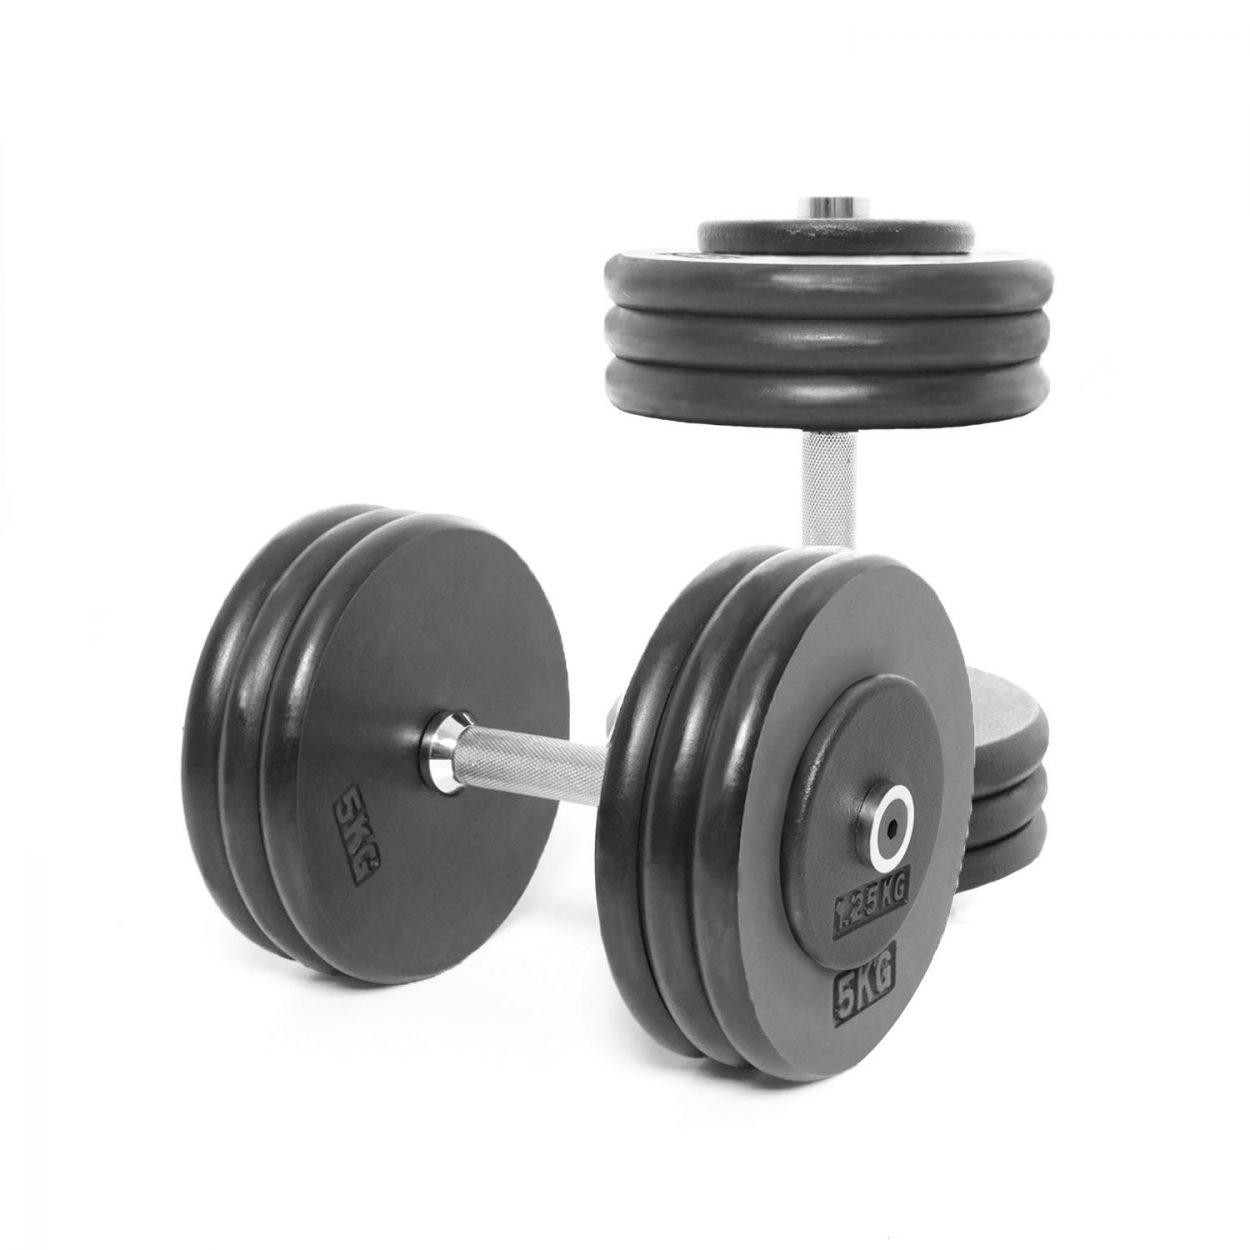 Body Power Pro-style Dumbbells 32.5kg (x2)